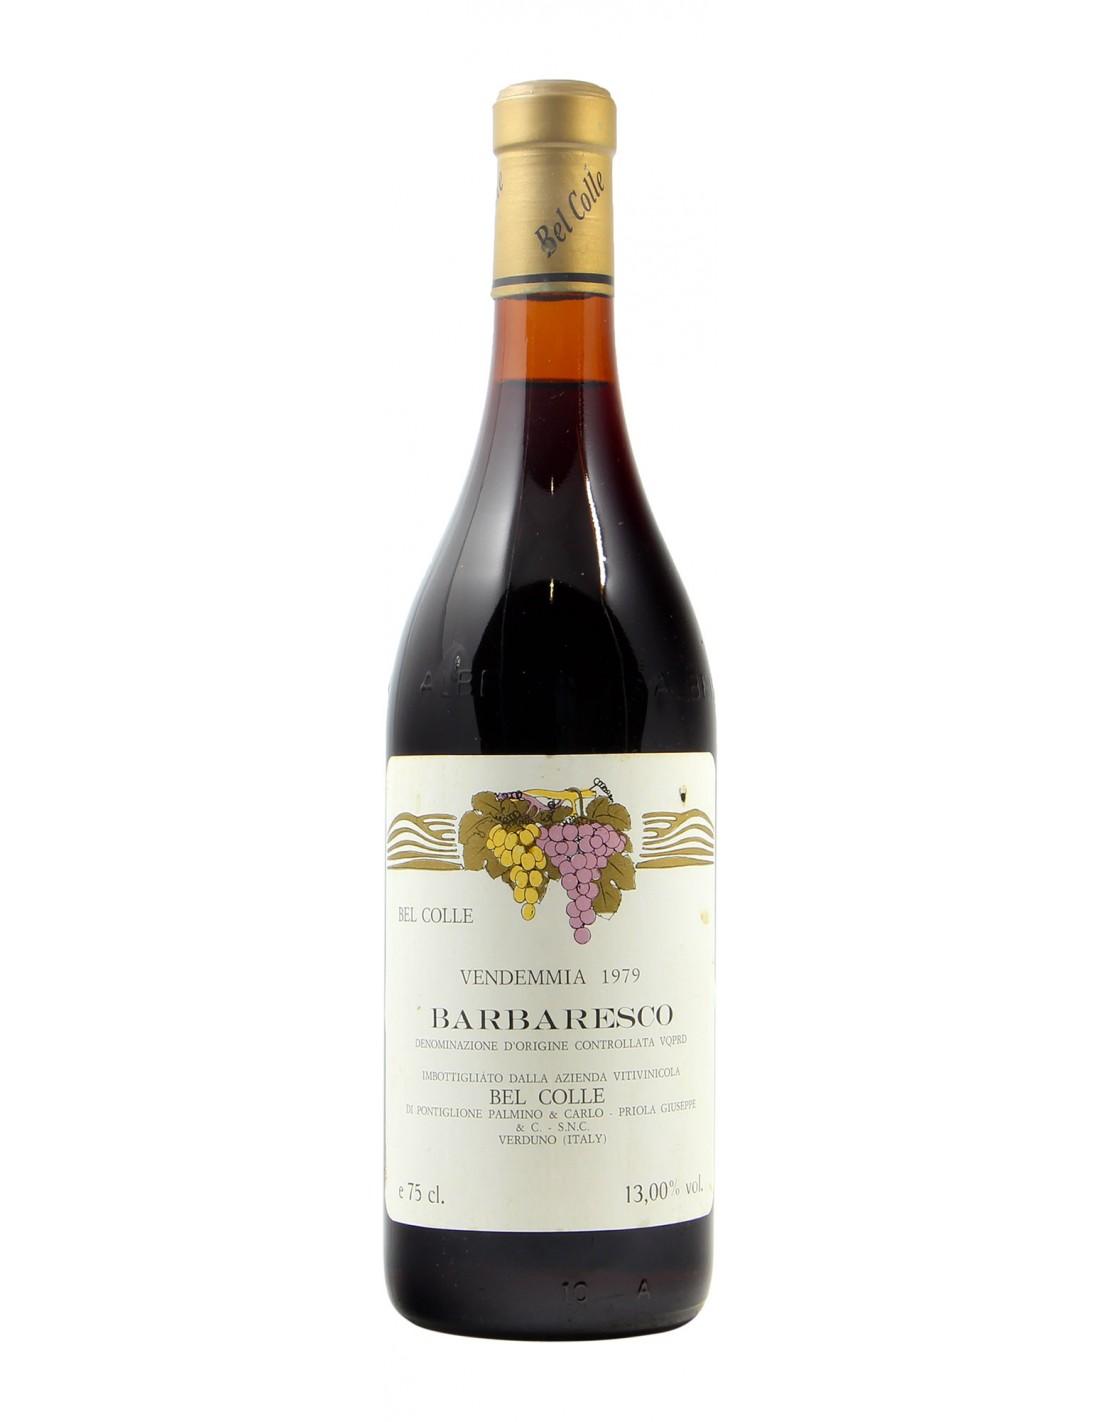 BARBARESCO 1979 BEL COLLE Grandi Bottiglie